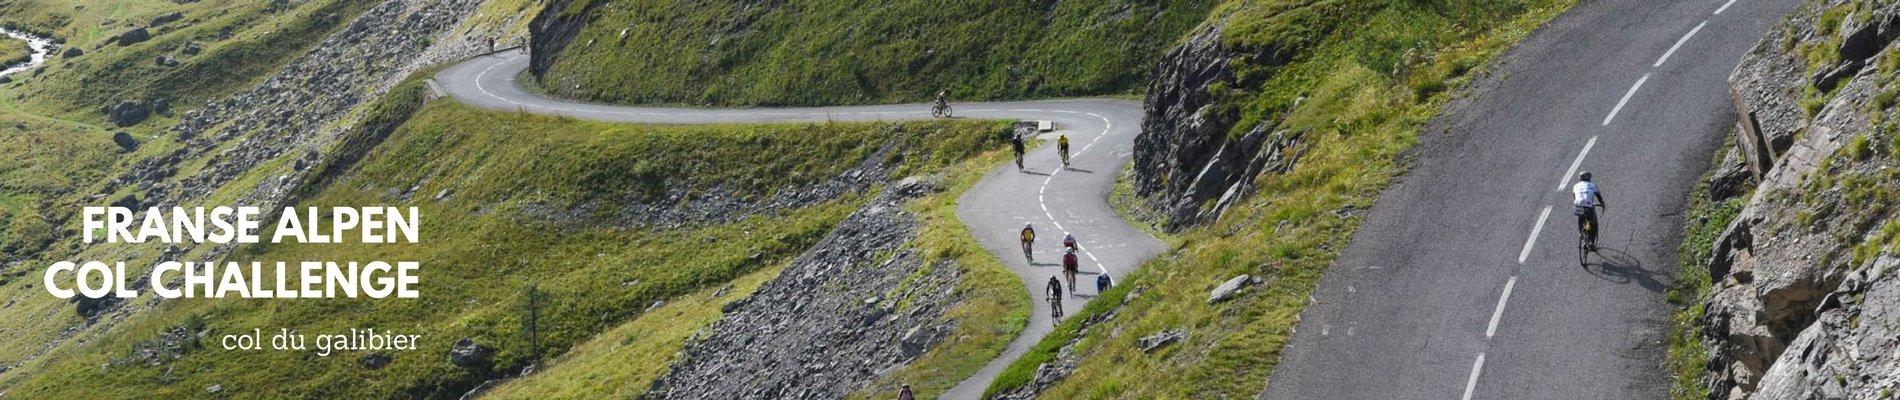 Franse Alpen Col Challenge 2018